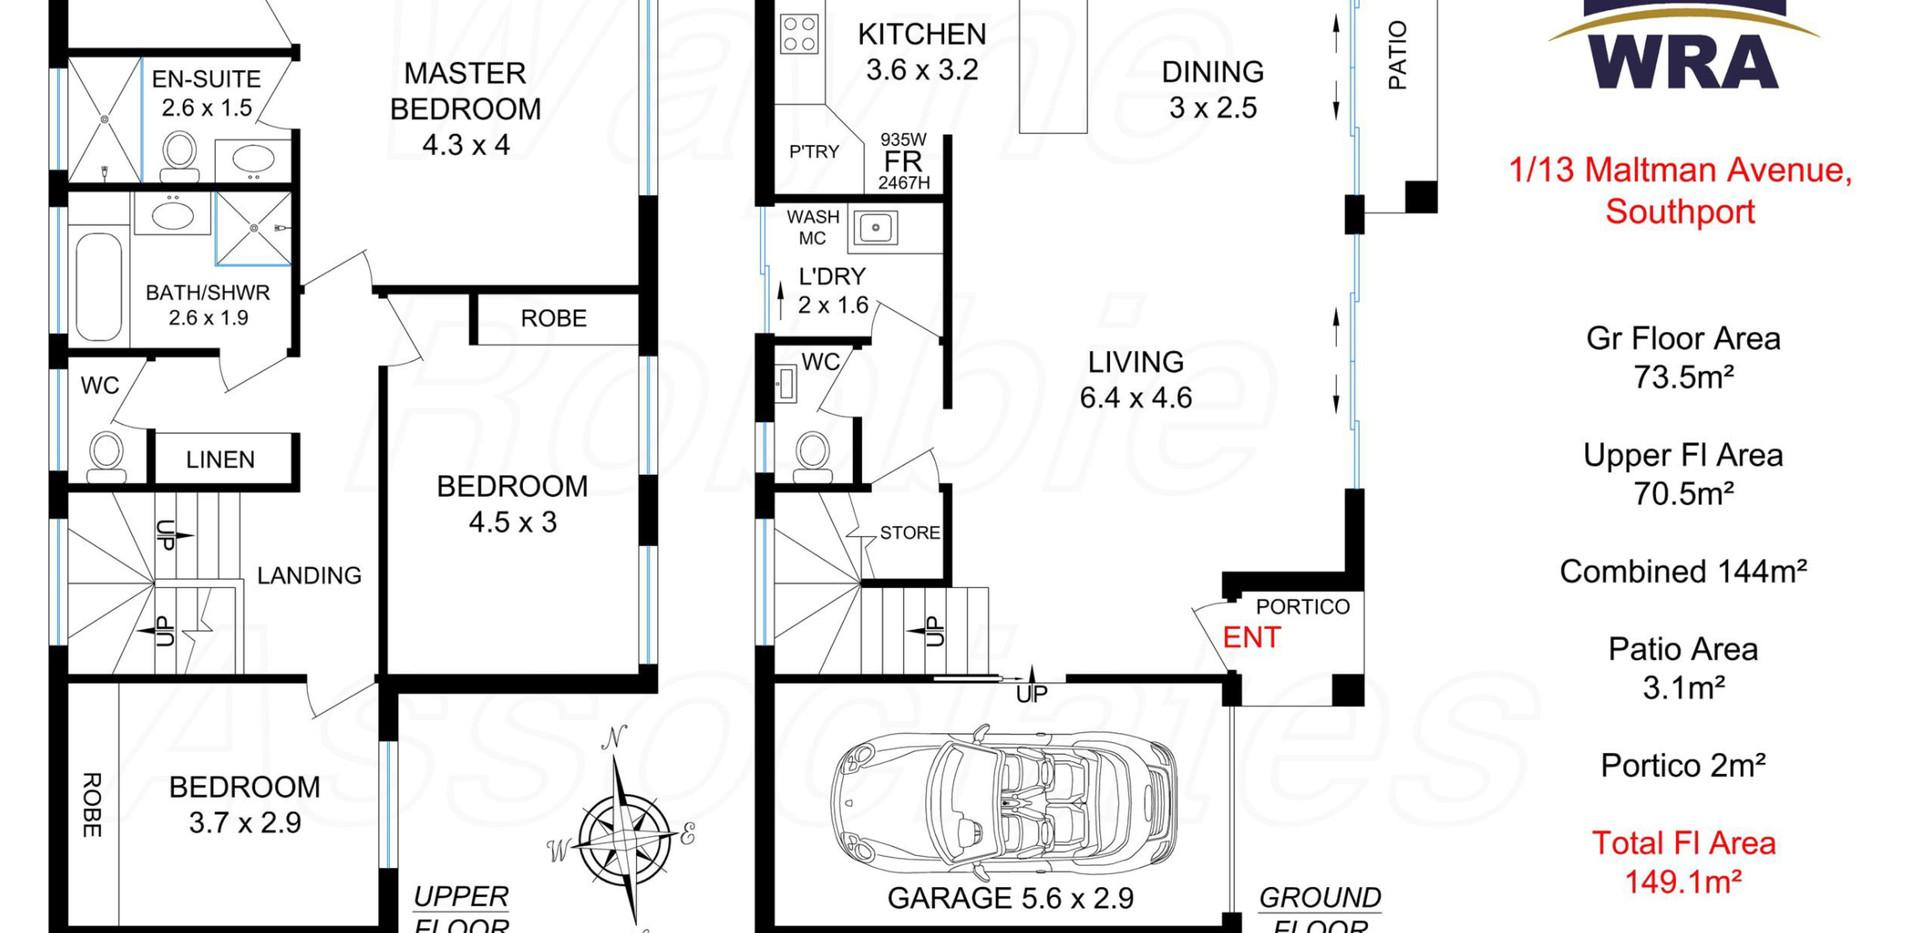 U1_13 Maltman Floor Plan.jpg